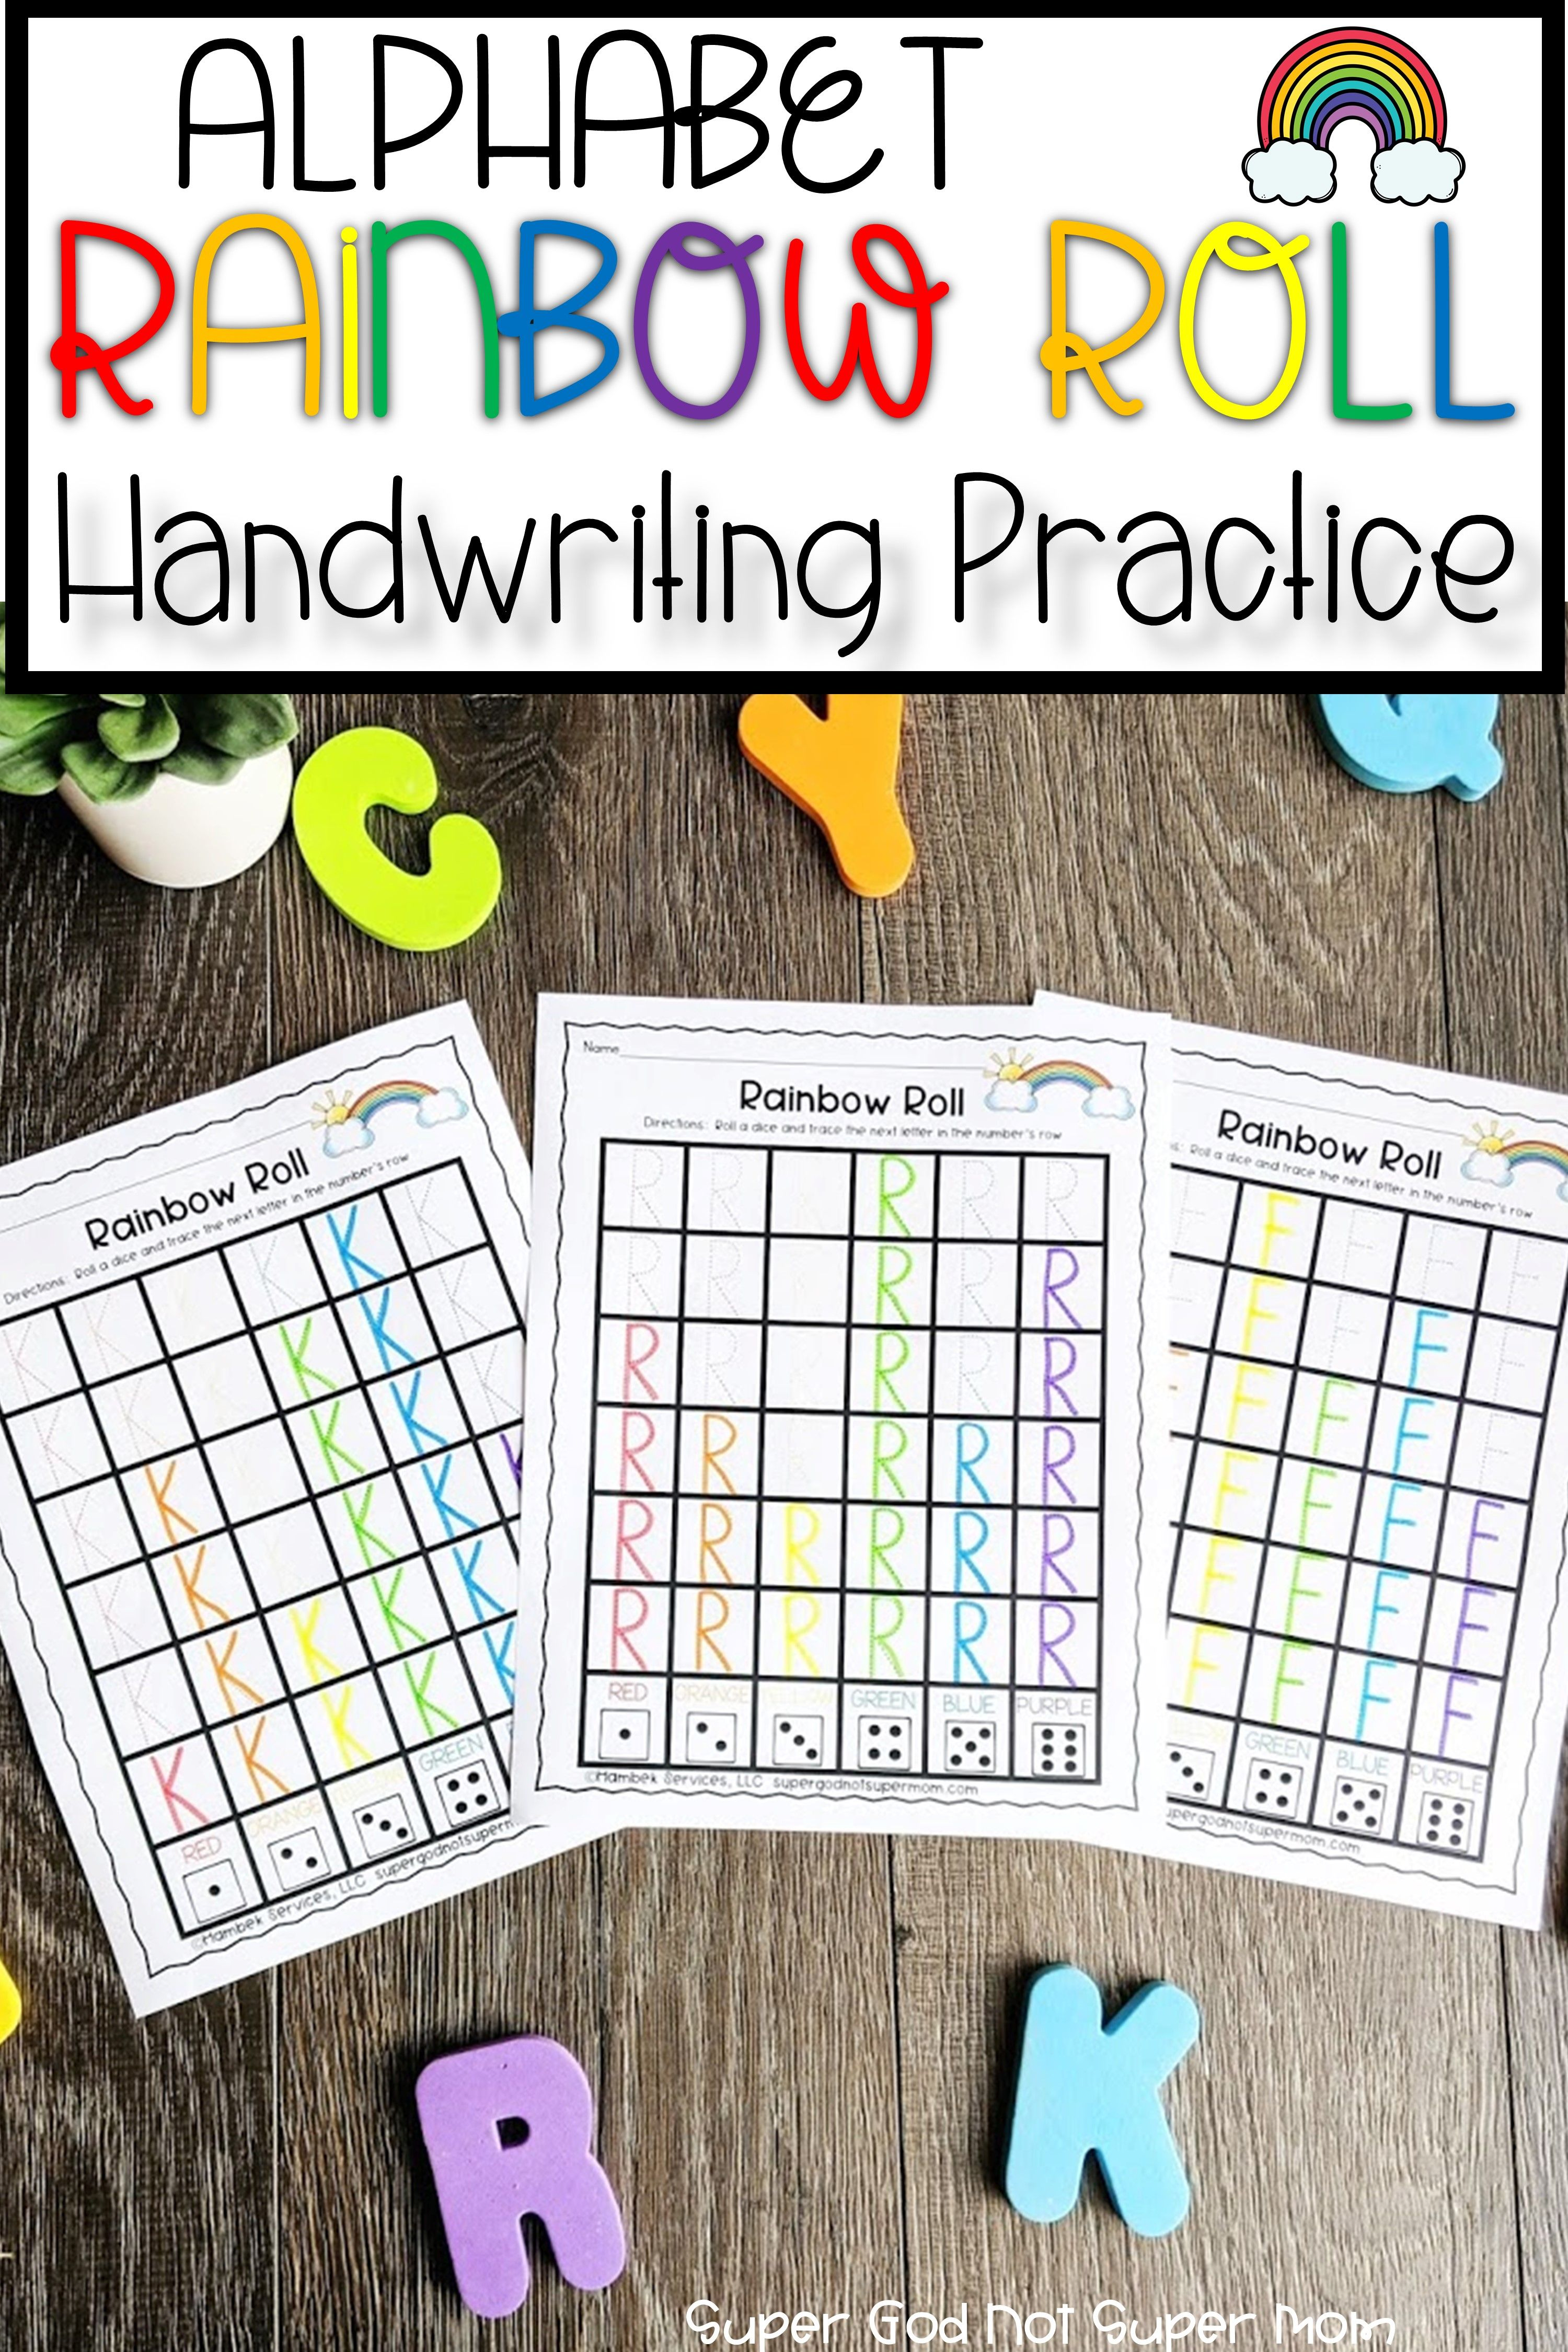 Alphabet Handwriting Worksheets Super God Not Super Mom Alphabet Activities Preschool Alphabet Activities Alphabet Preschool [ 4500 x 3000 Pixel ]